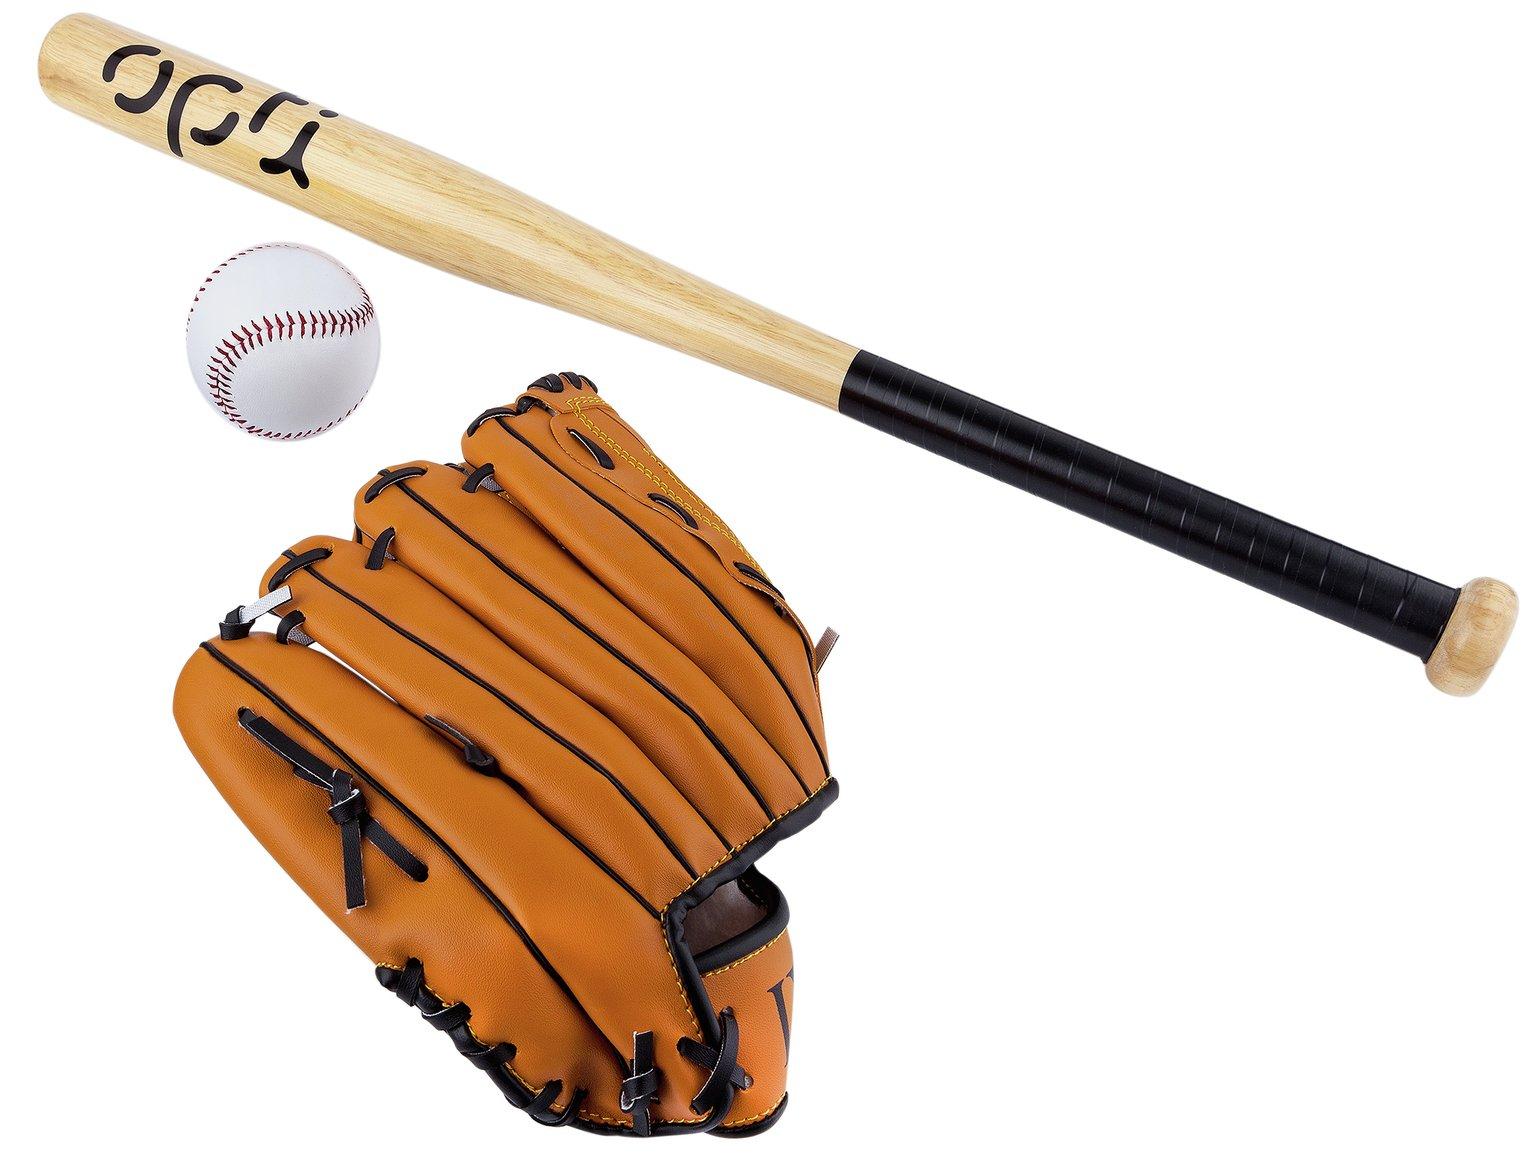 Opti Baseball Bat, Ball and Glove Set - 25 Inch